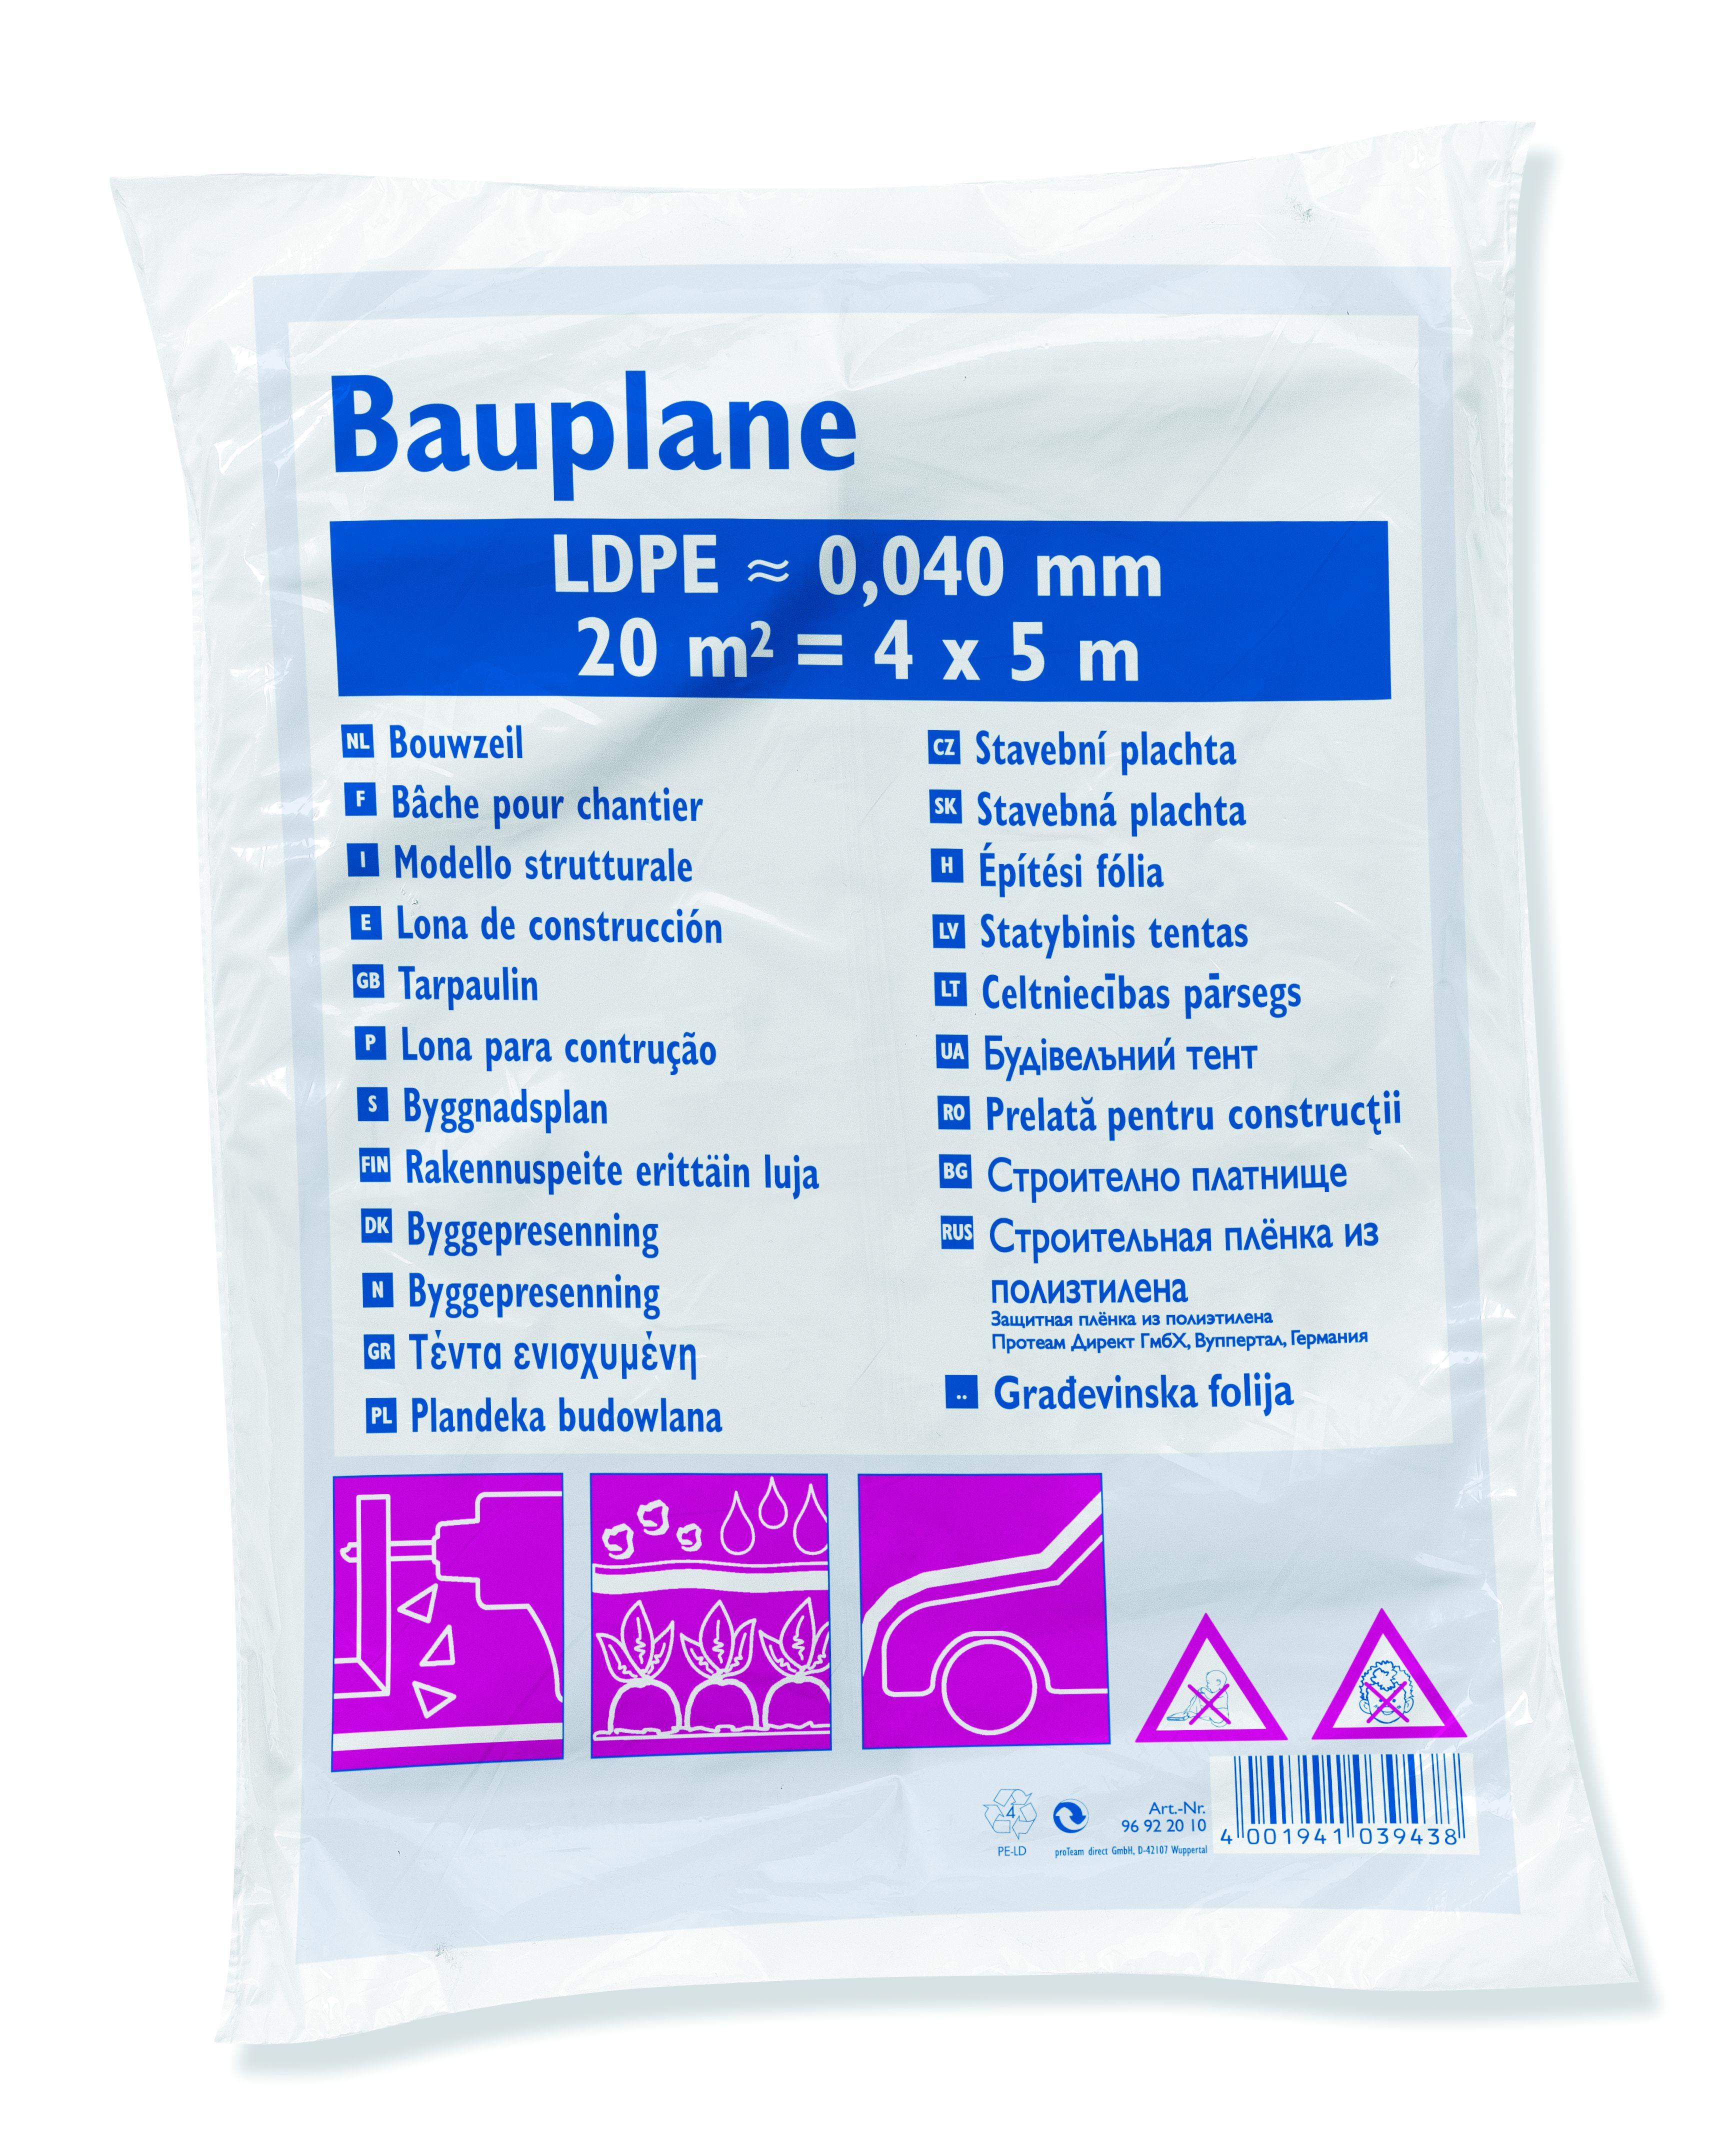 PaintMaster LDPE-Bauplane